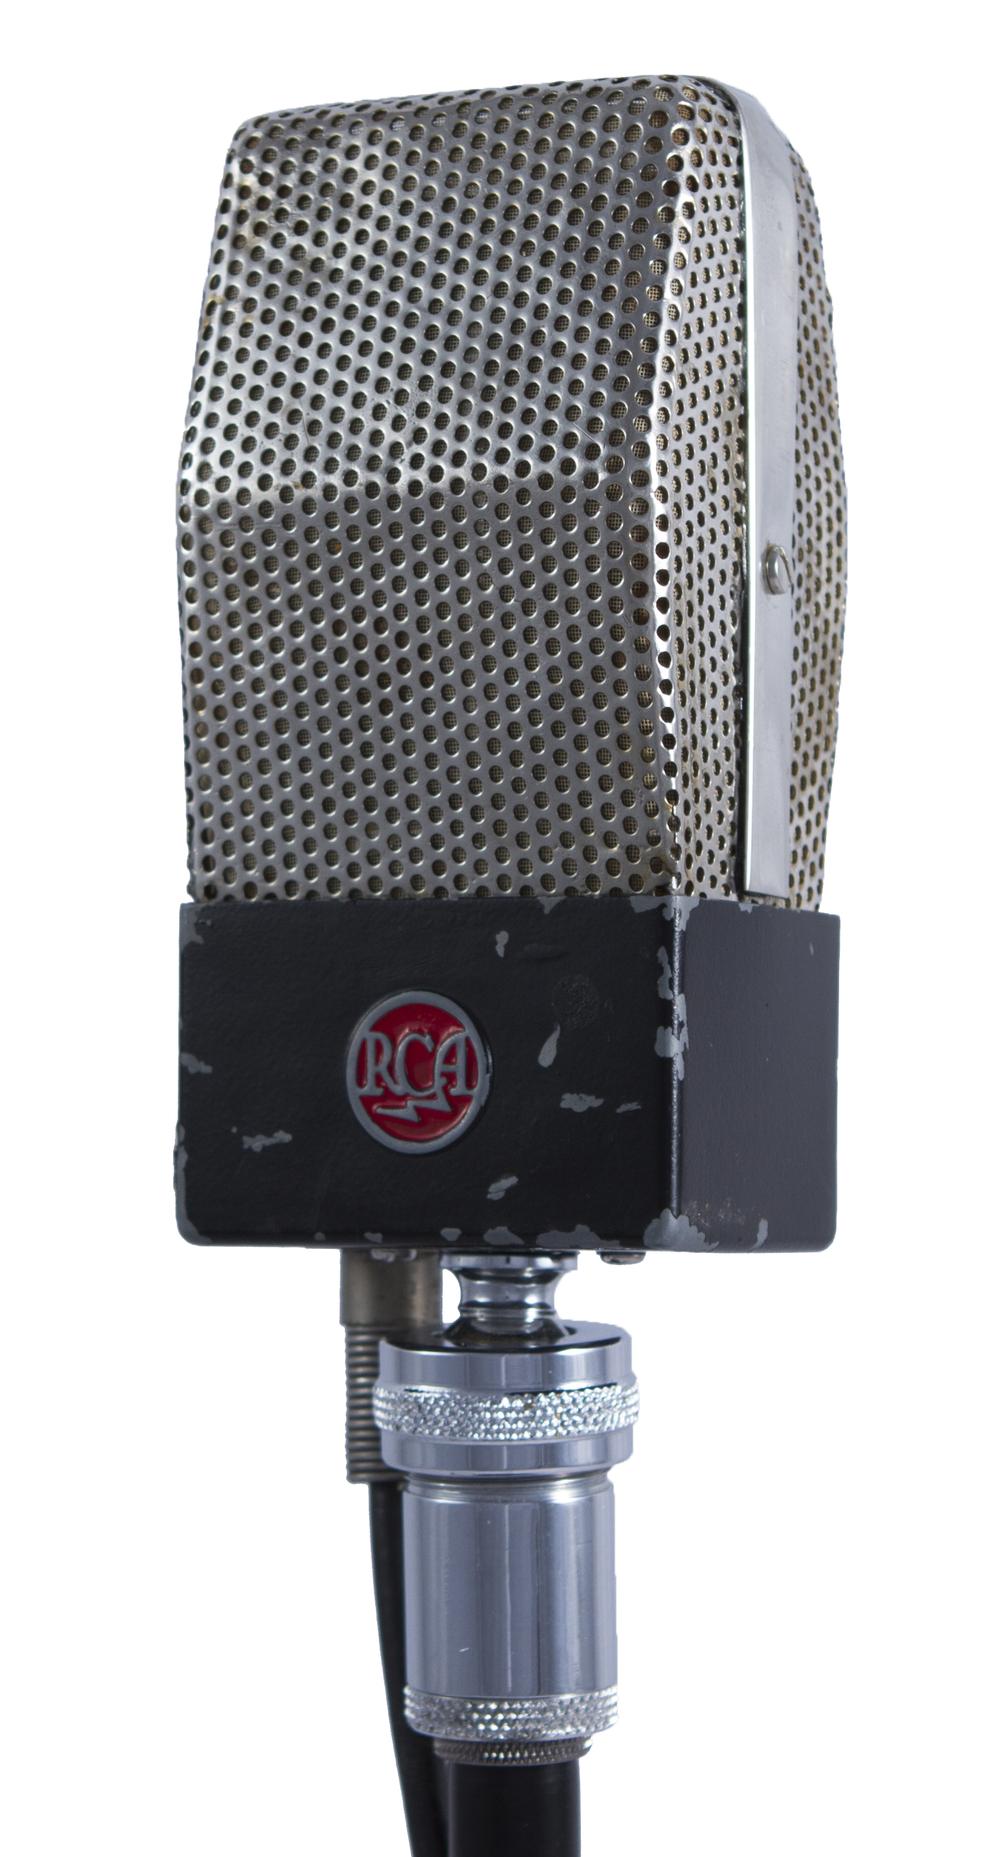 RCA 74 Jr Velocity.jpg